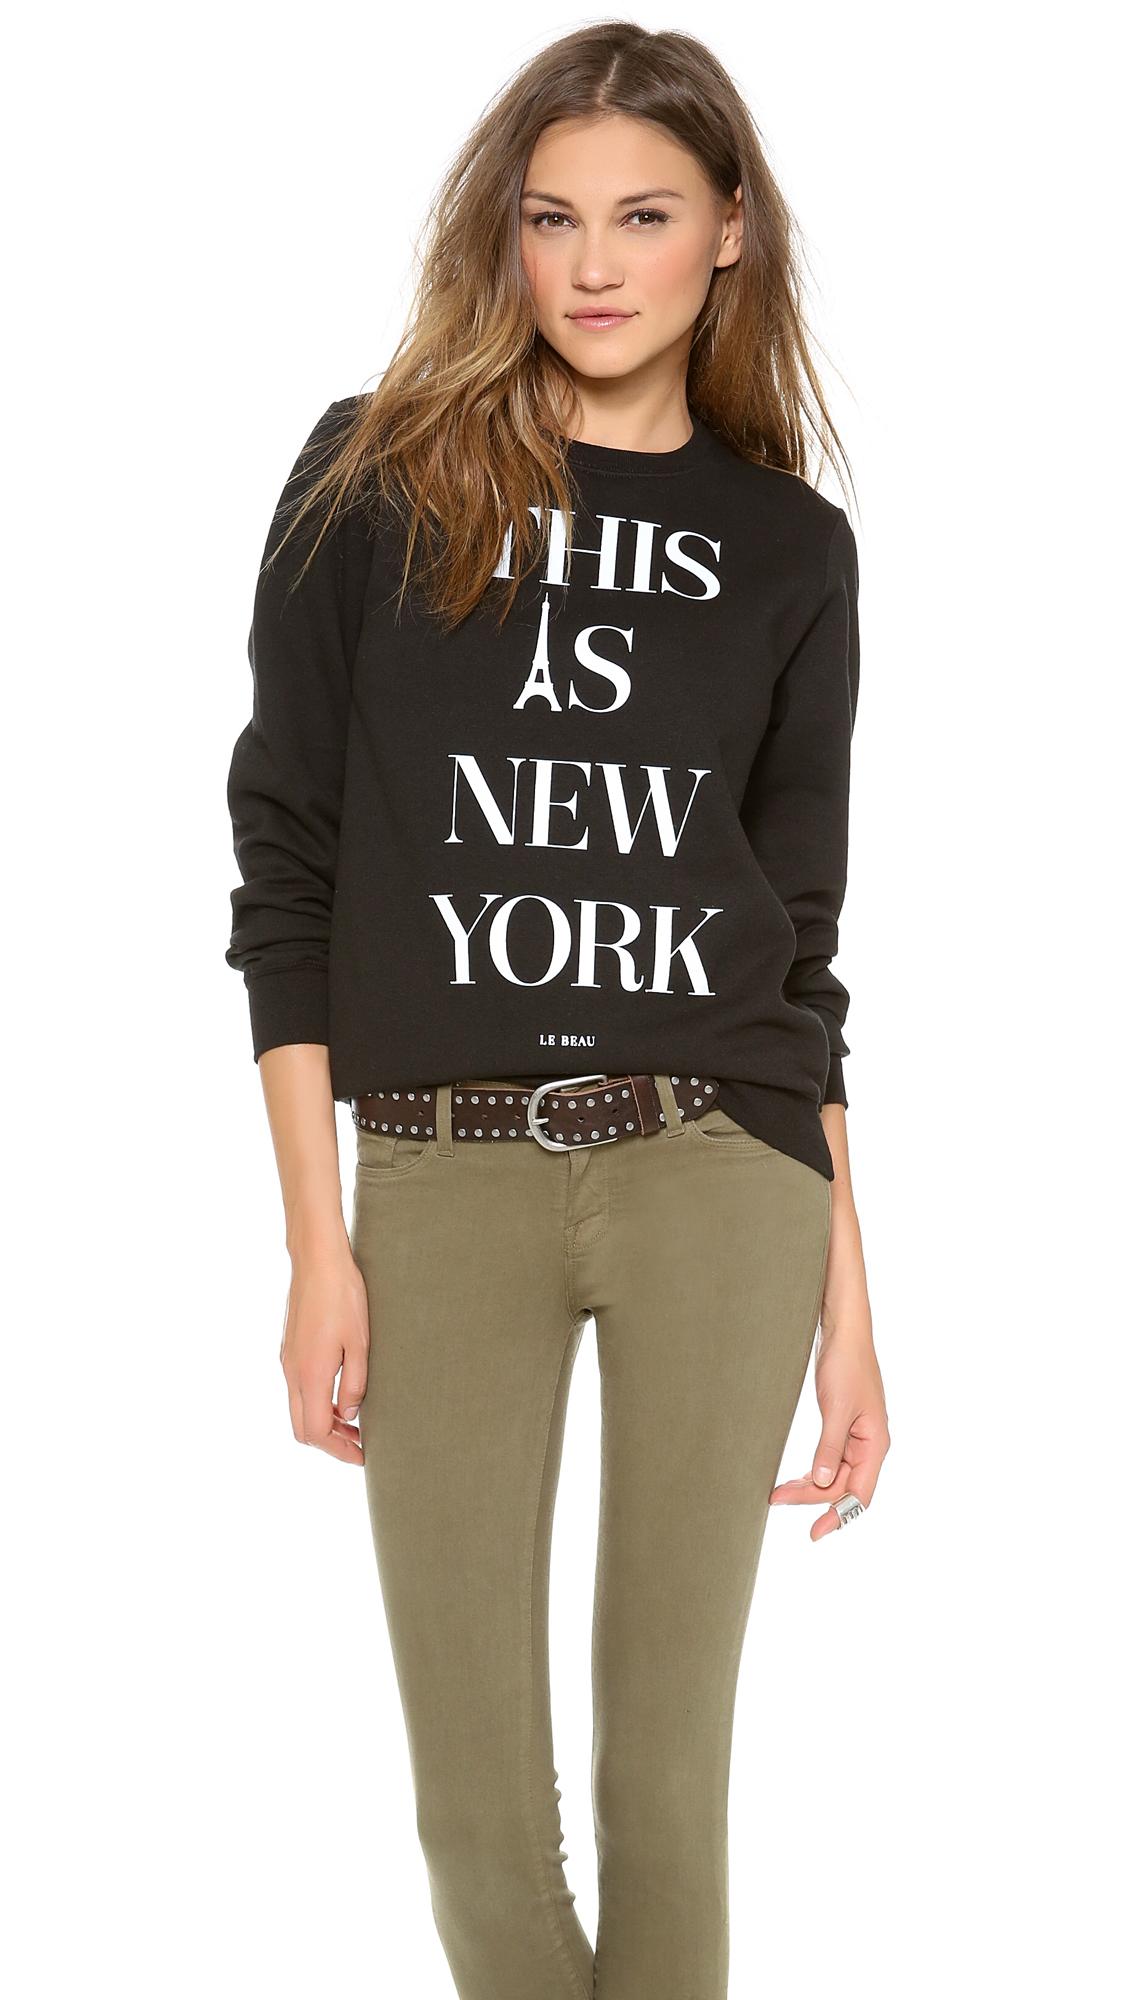 Le Beau This Is New York Sweatshirt ($53)